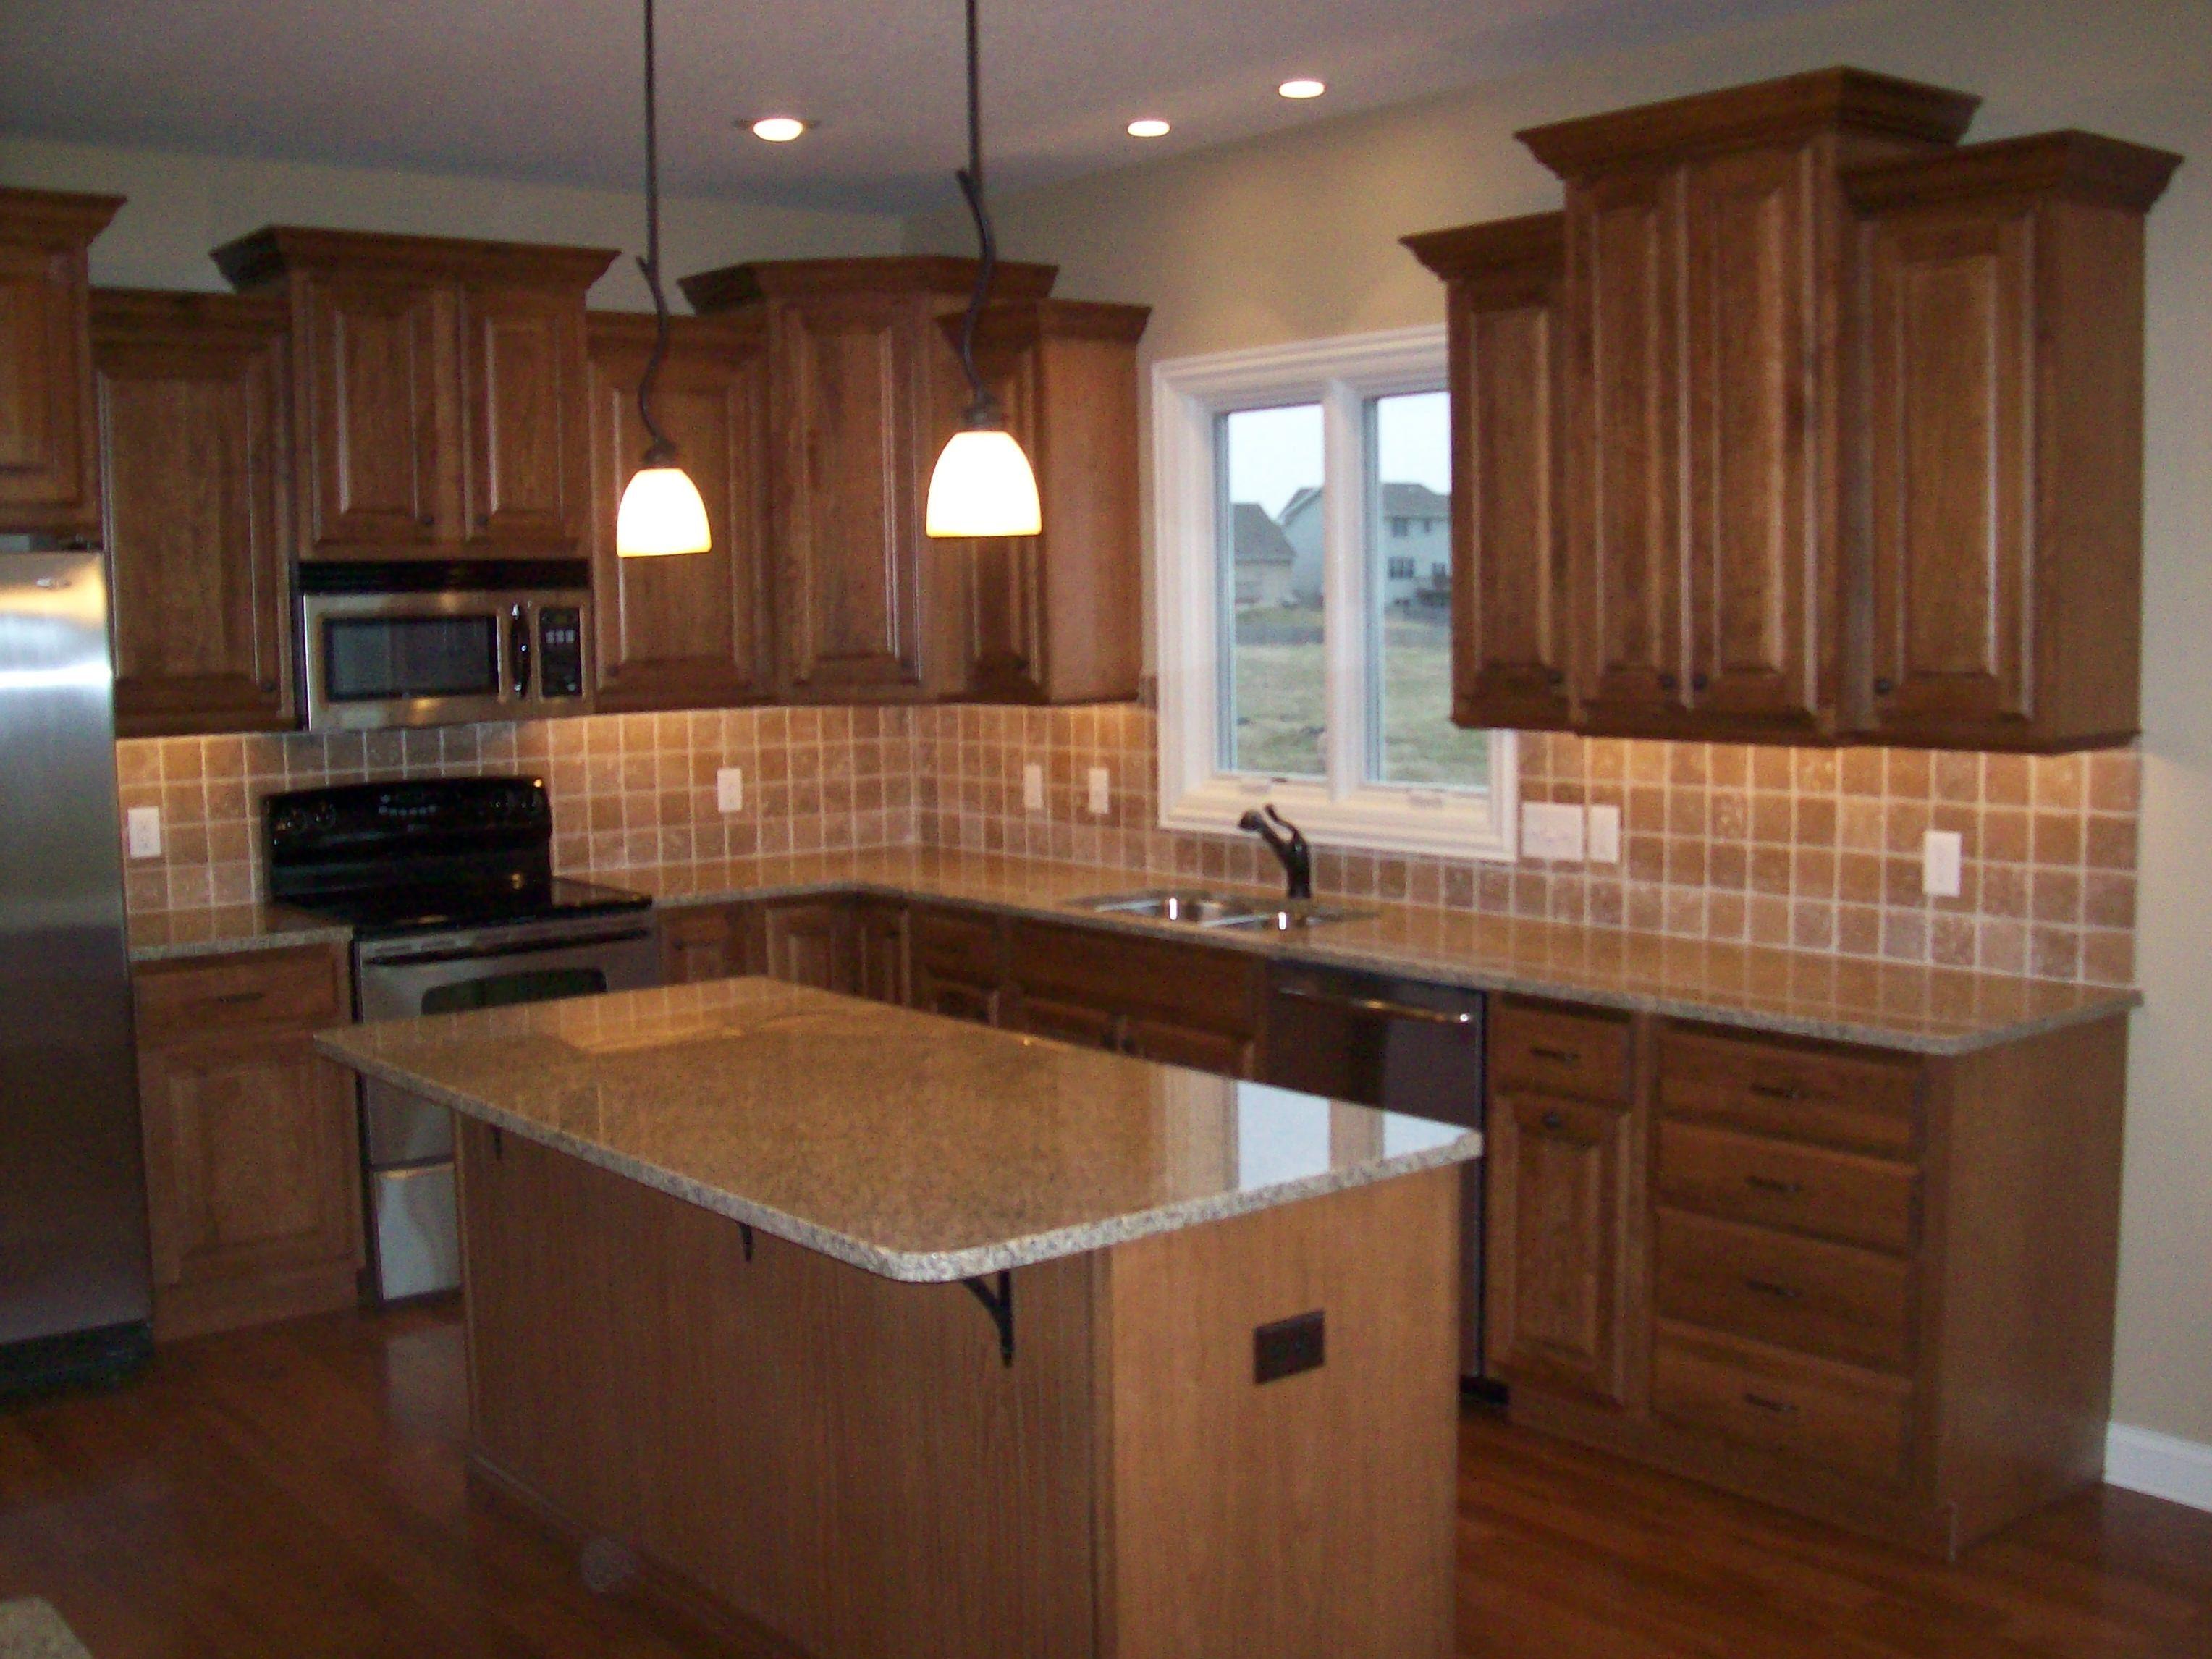 Kitchen, Cherry Kitchen Cabinets For Modern Kitchen Island And Elegant  Kitchen Backsplash With Washstand Also Cabinets Lighting Along With  Laminateu2026